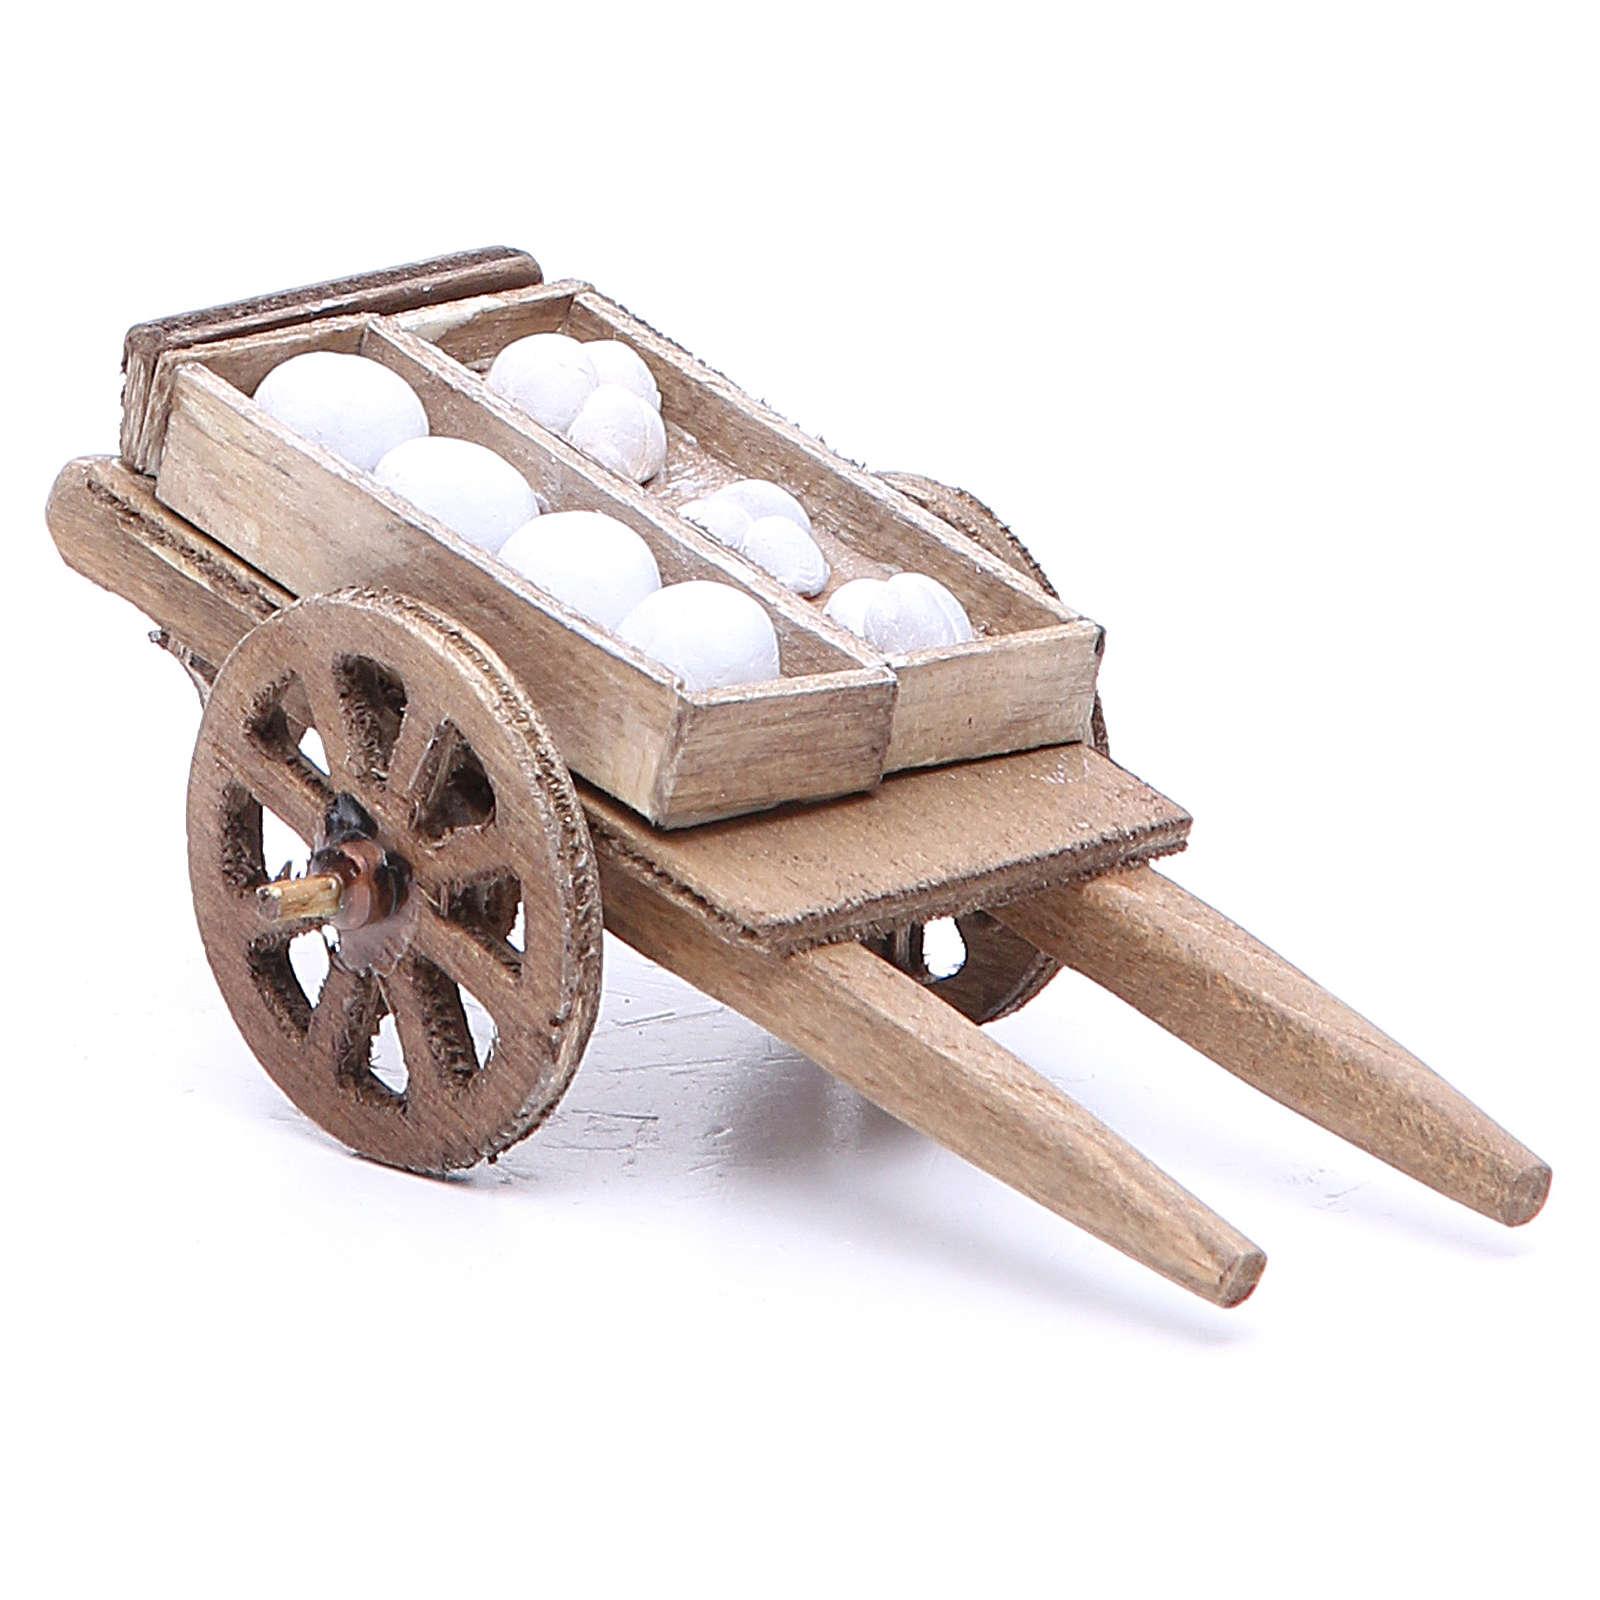 Cart of the baker for Neapolitan Nativity, measuring 5x11x5cm 4